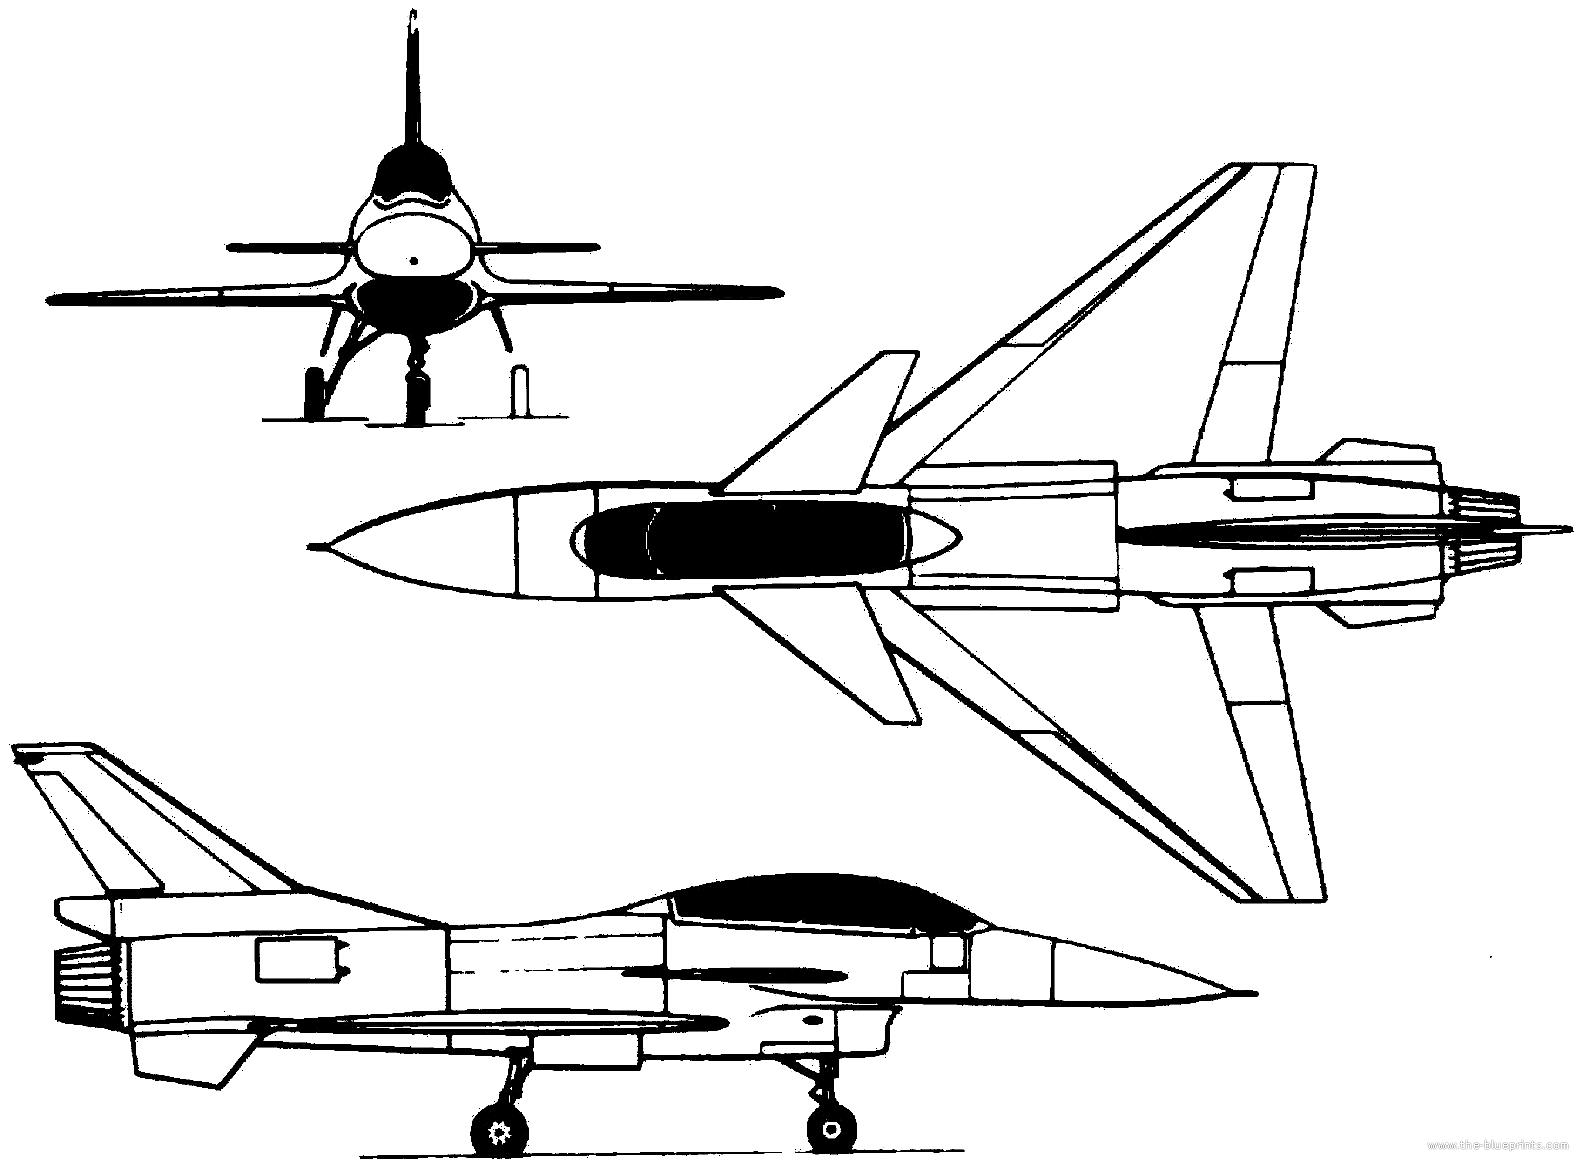 Blueprints Gt Modern Airplanes Gt Modern I Gt Iai Lavi B 2